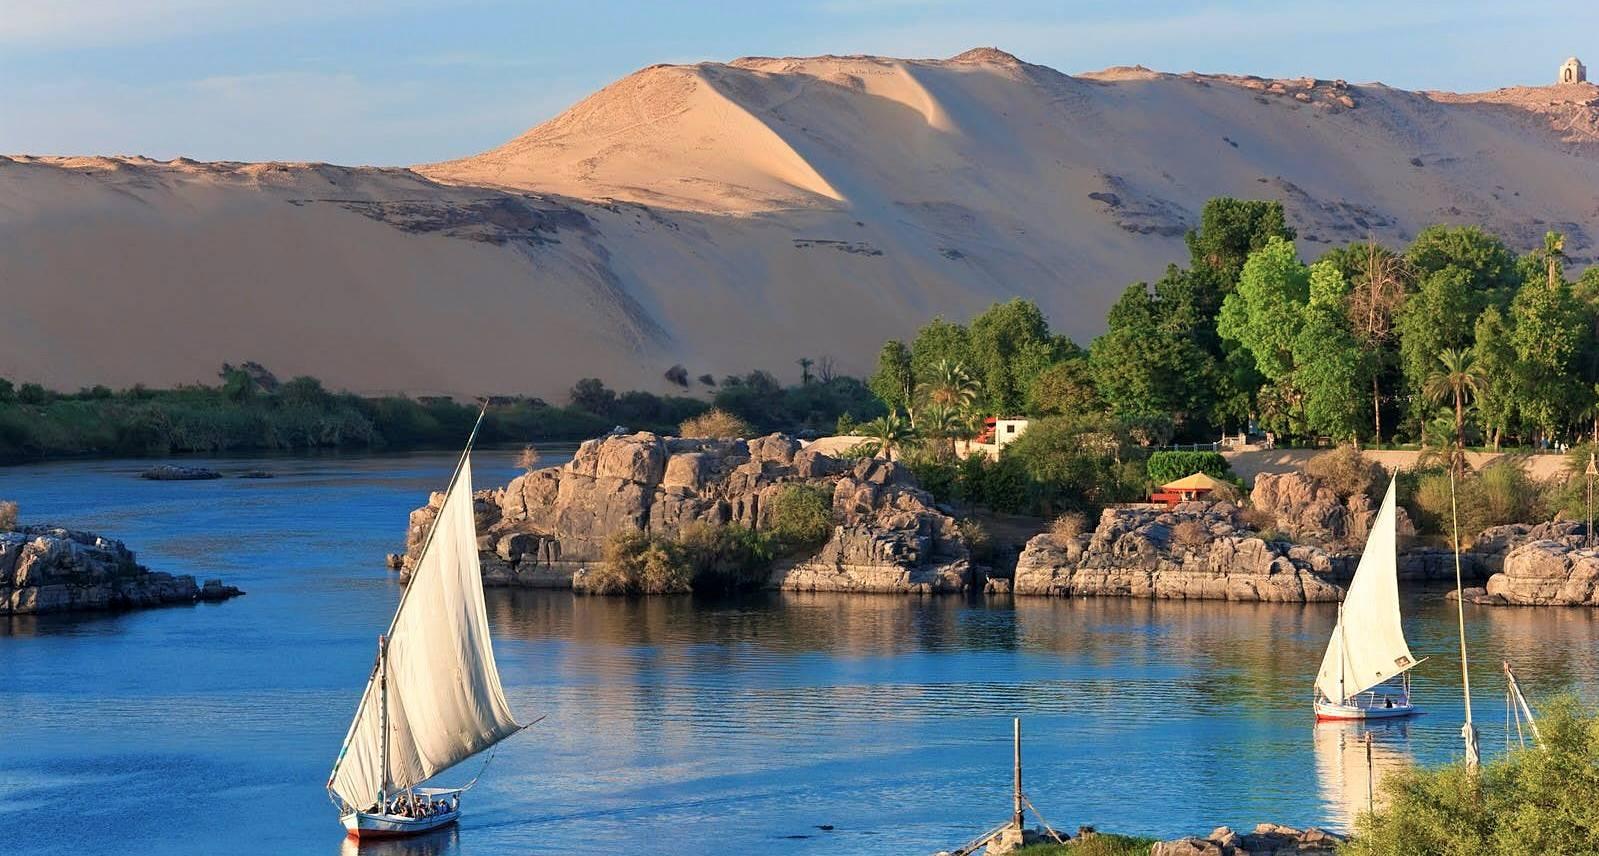 Ägypten Rundreise 1 Woche Kairo, Nilkreuzfahrt und Badeurlaub